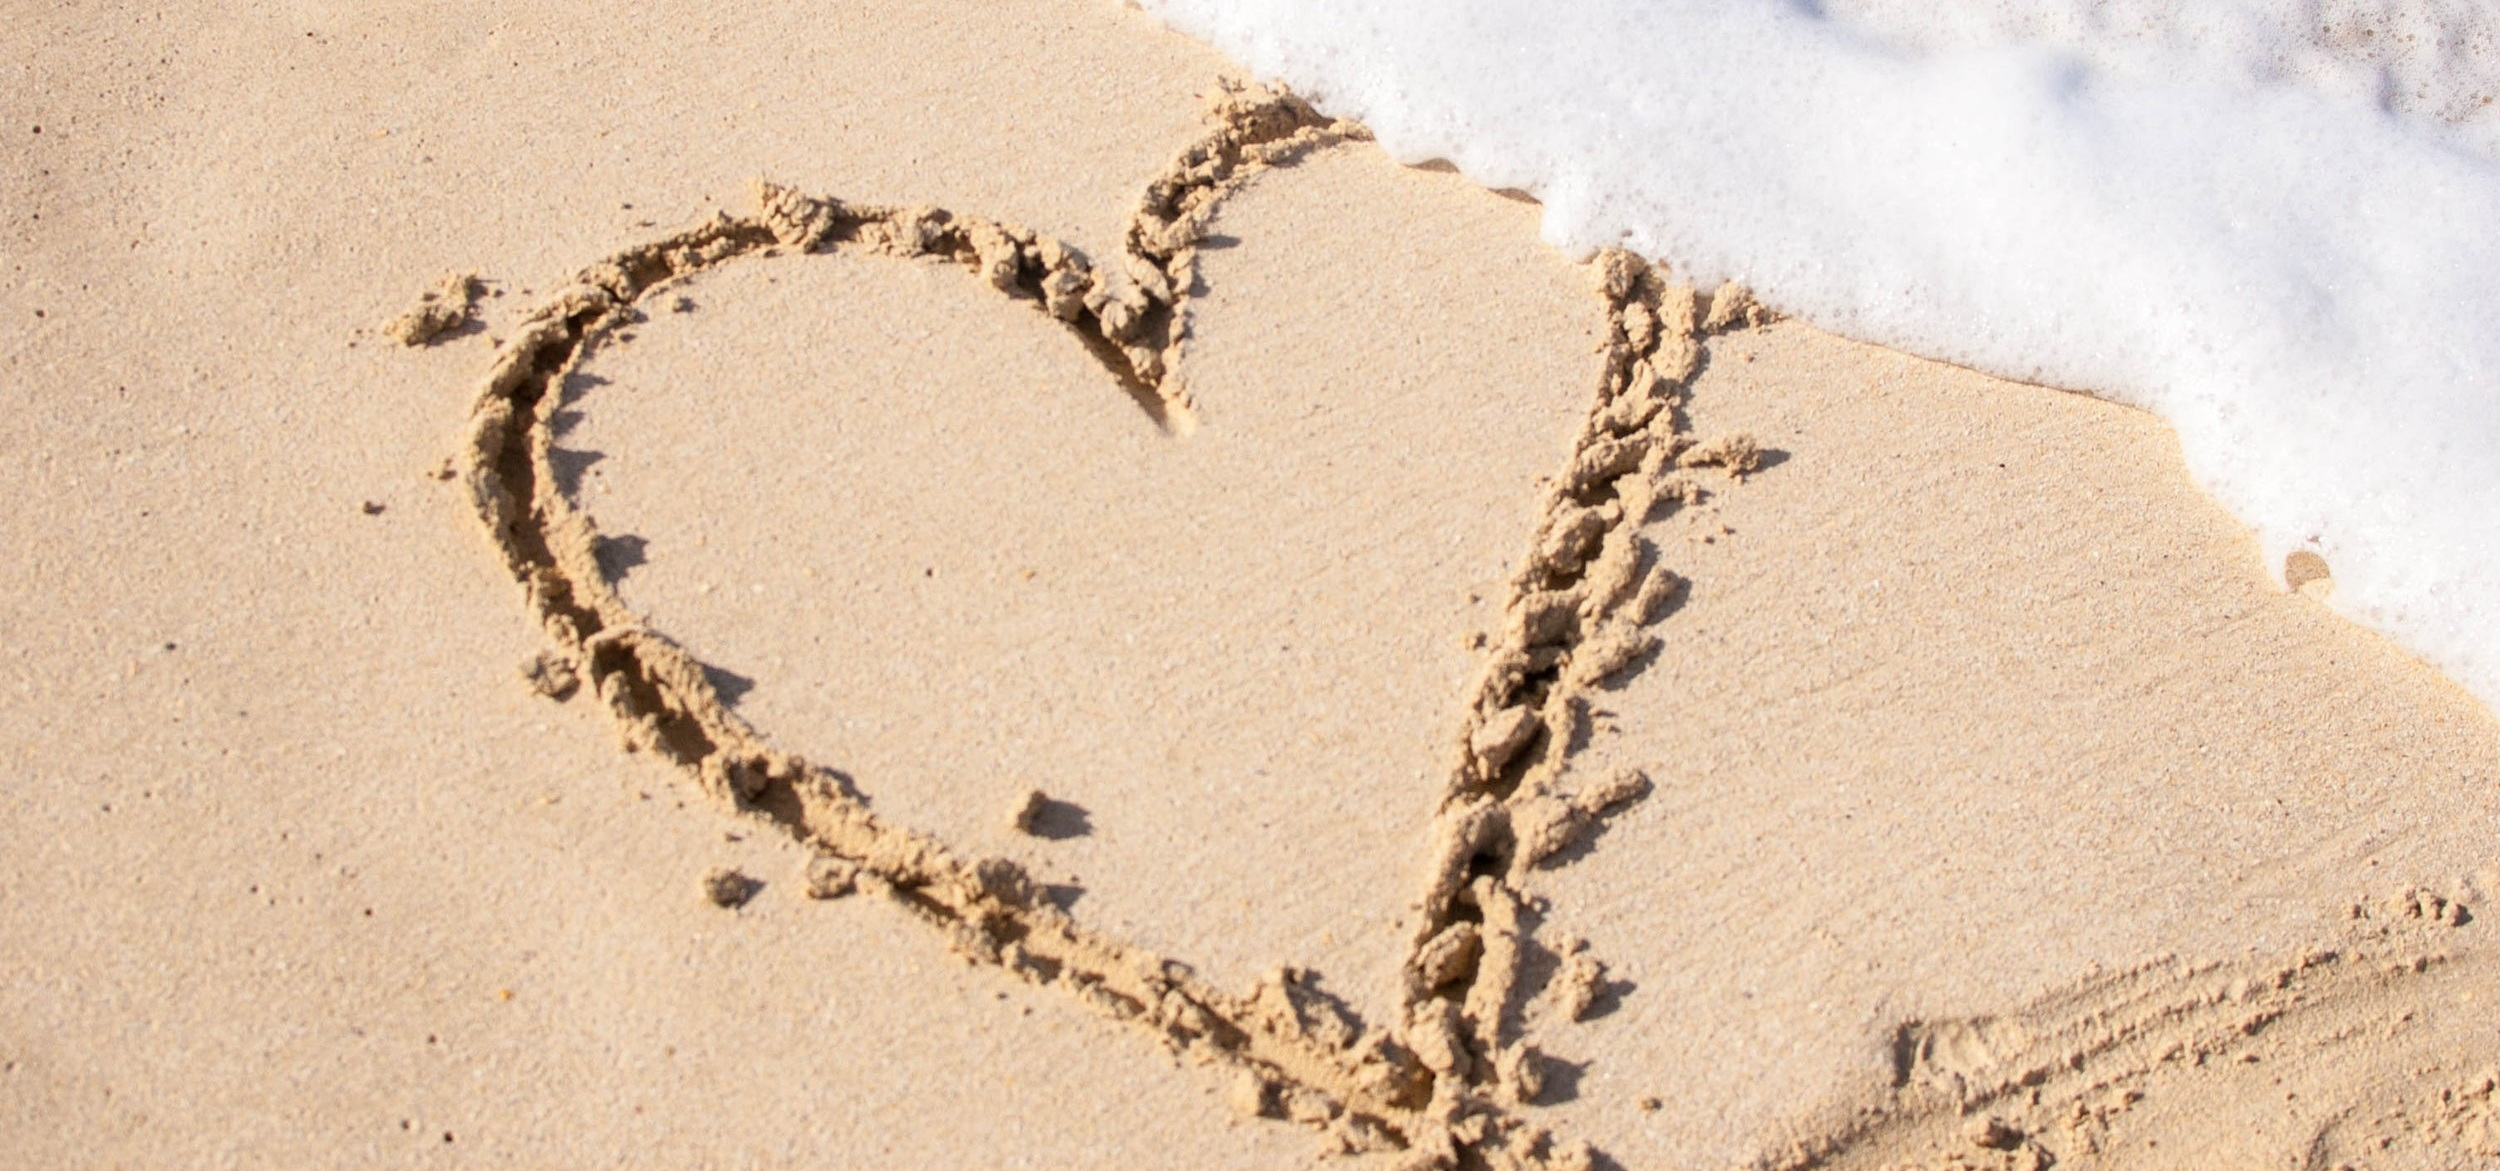 beach-drawing-foam-697740.jpg